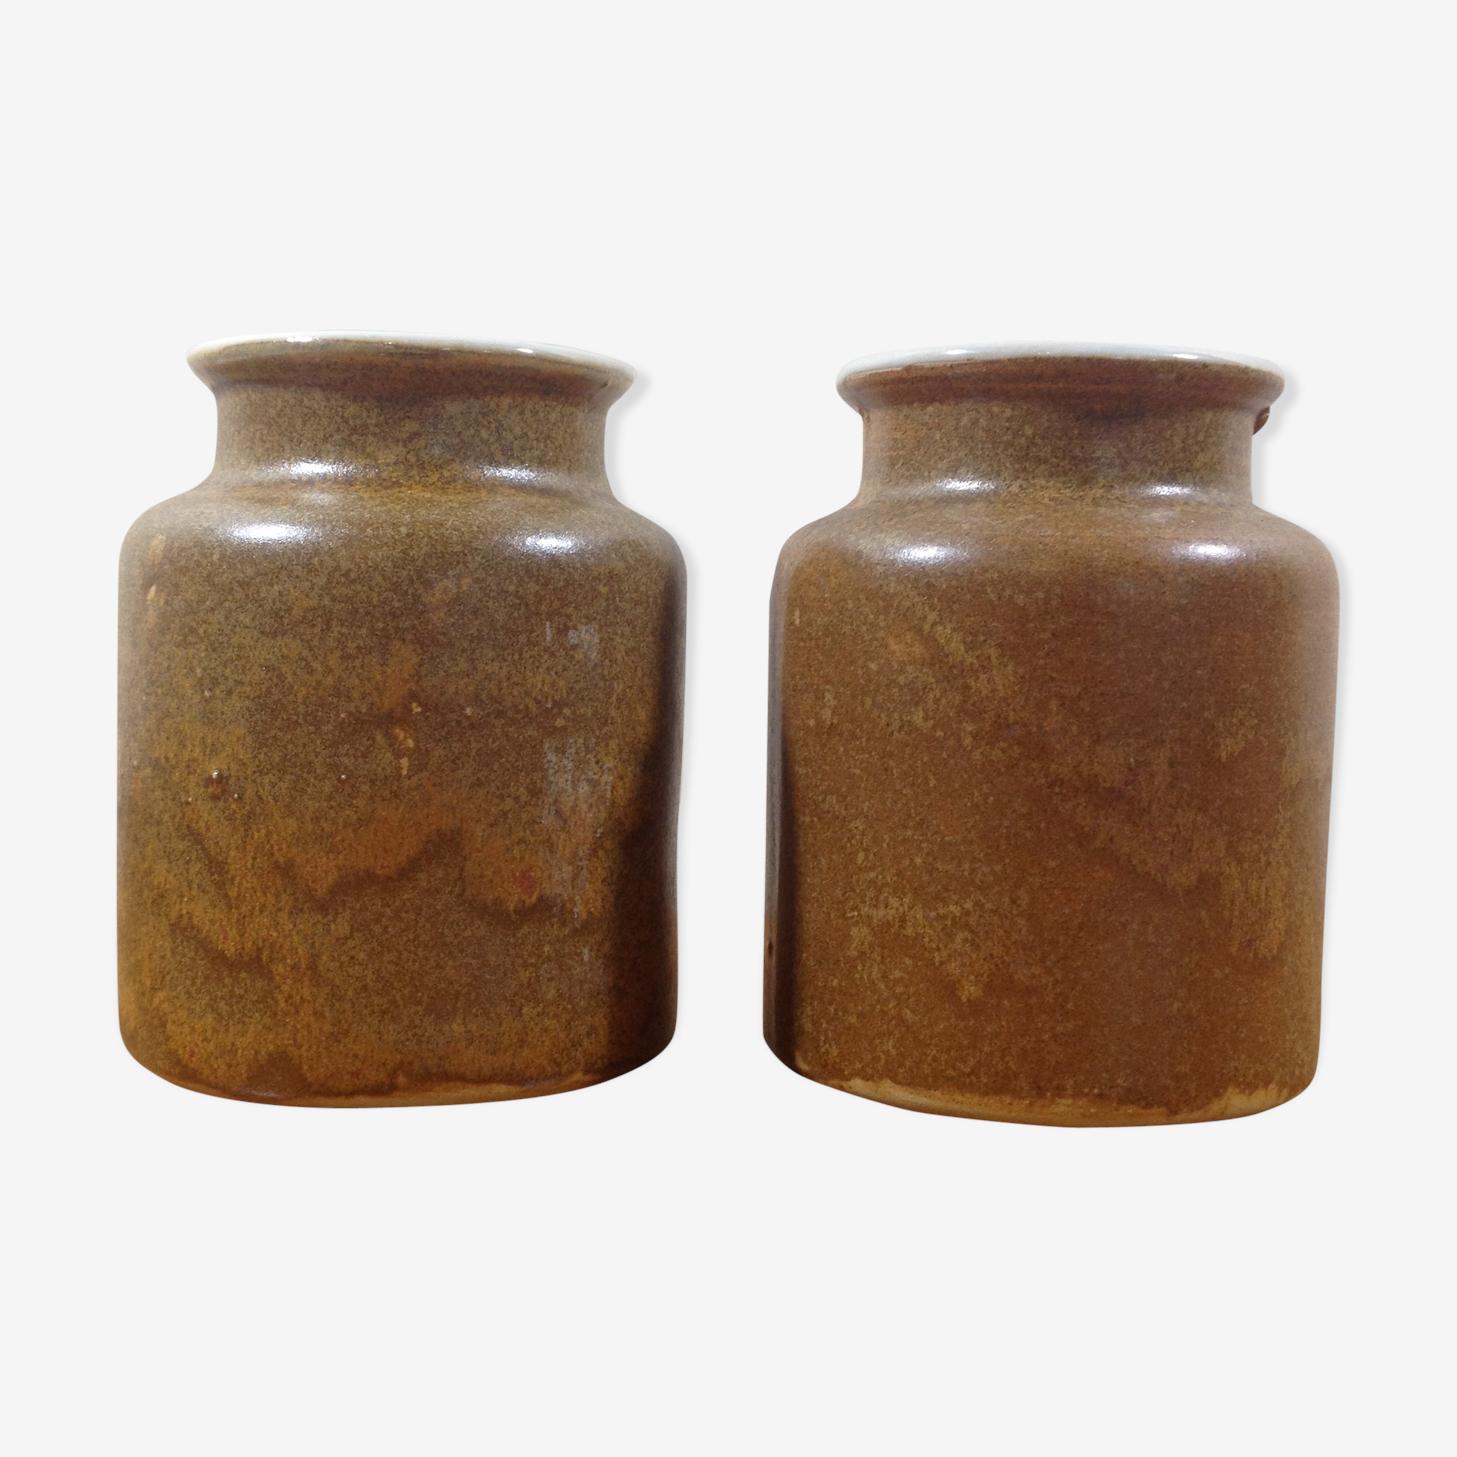 Pair of stoneware